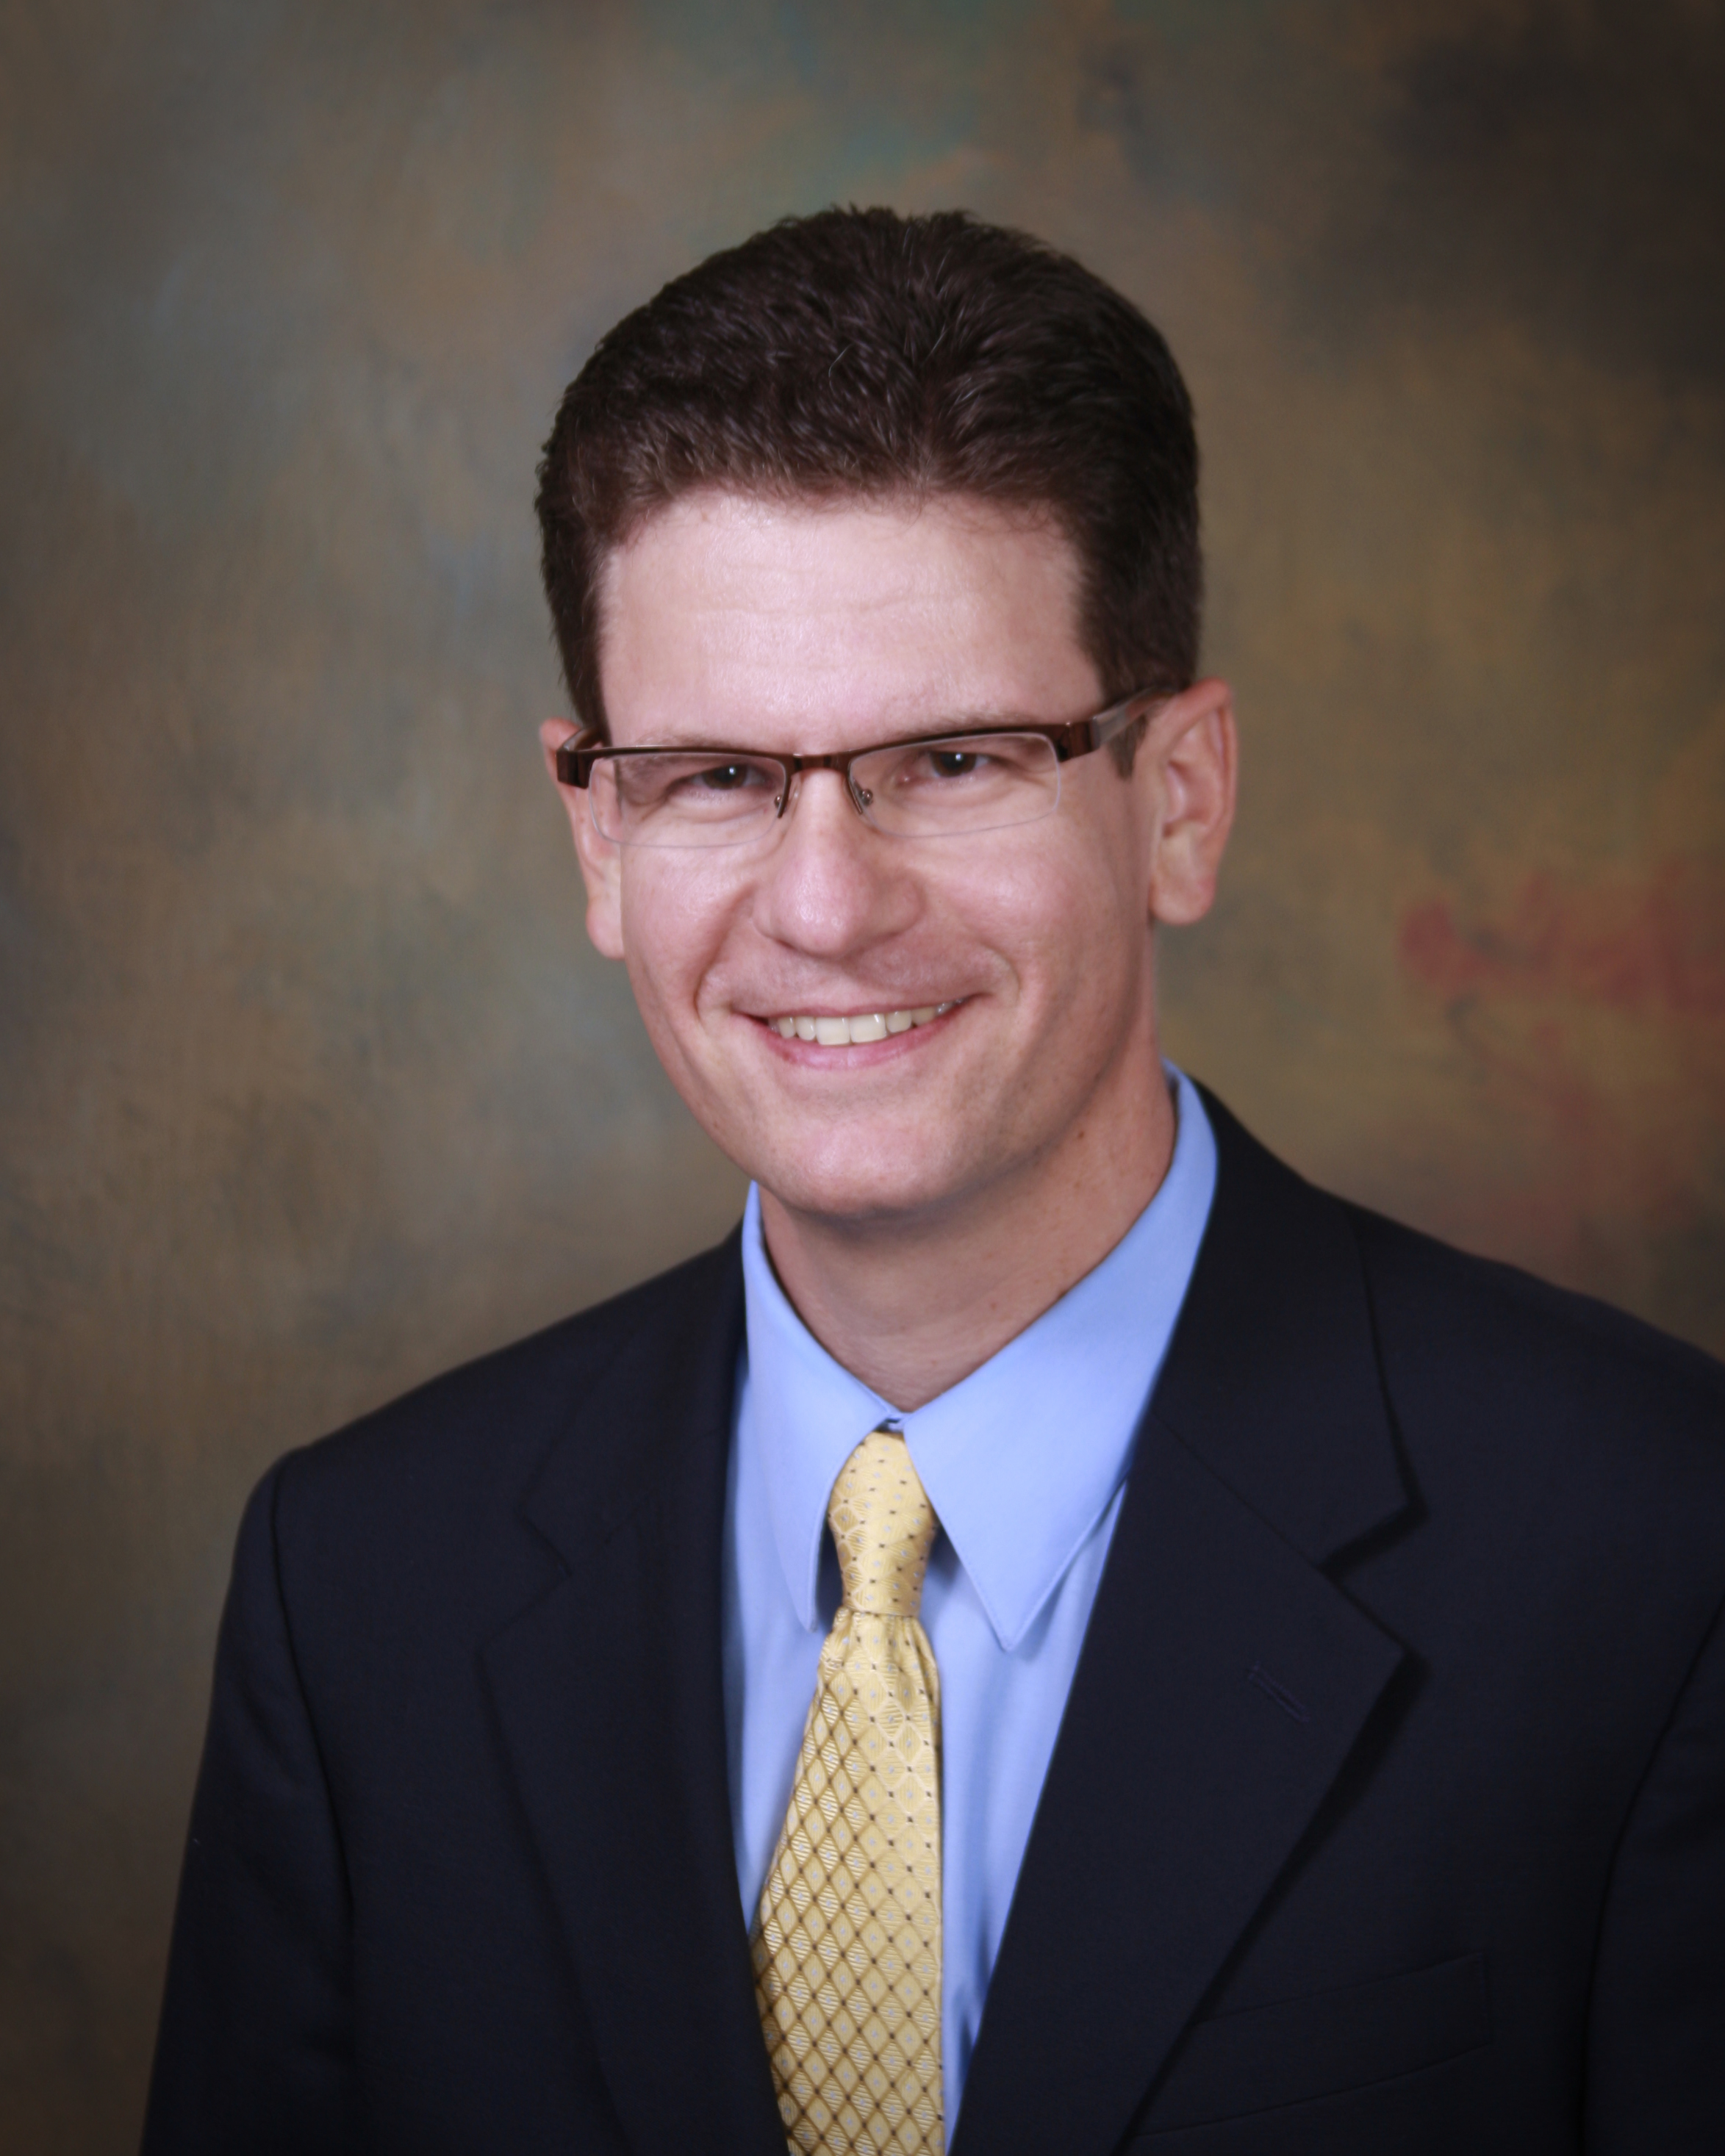 Michael J. Orlich, MD, PhD